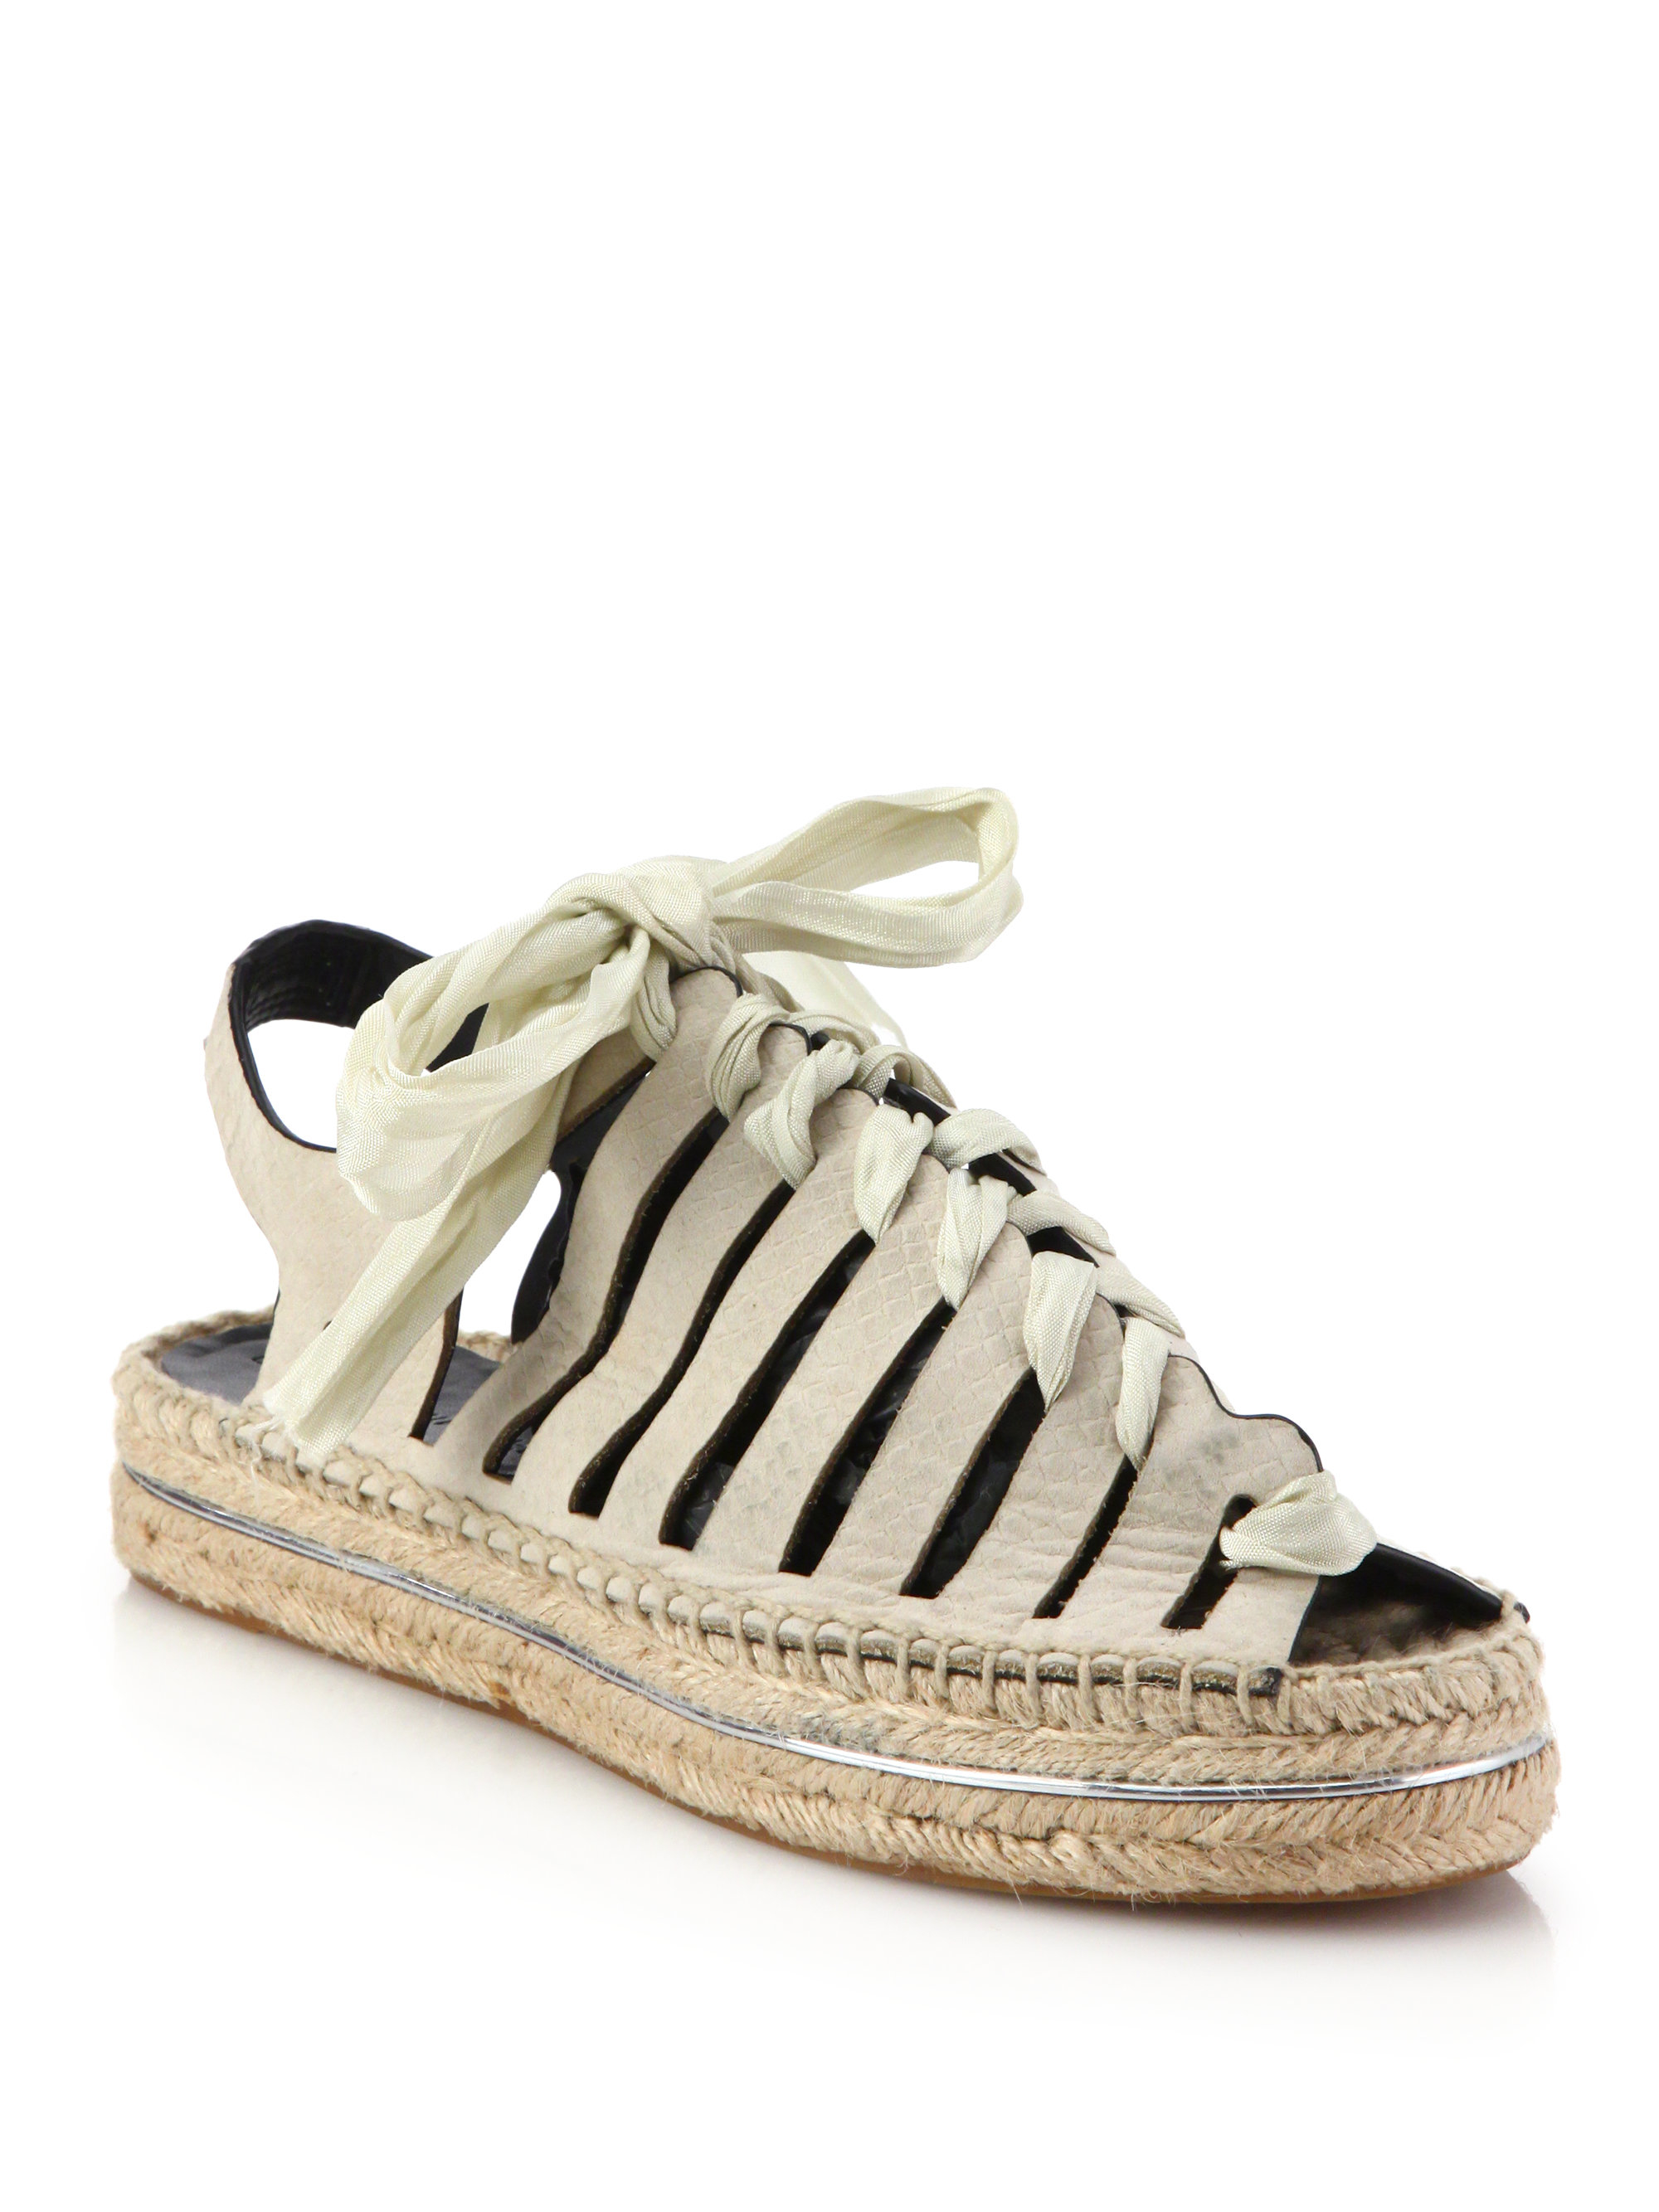 eb924367b200 Lyst - Rebecca Minkoff Gemma Lace-up Leather Espadrille Sandals in White